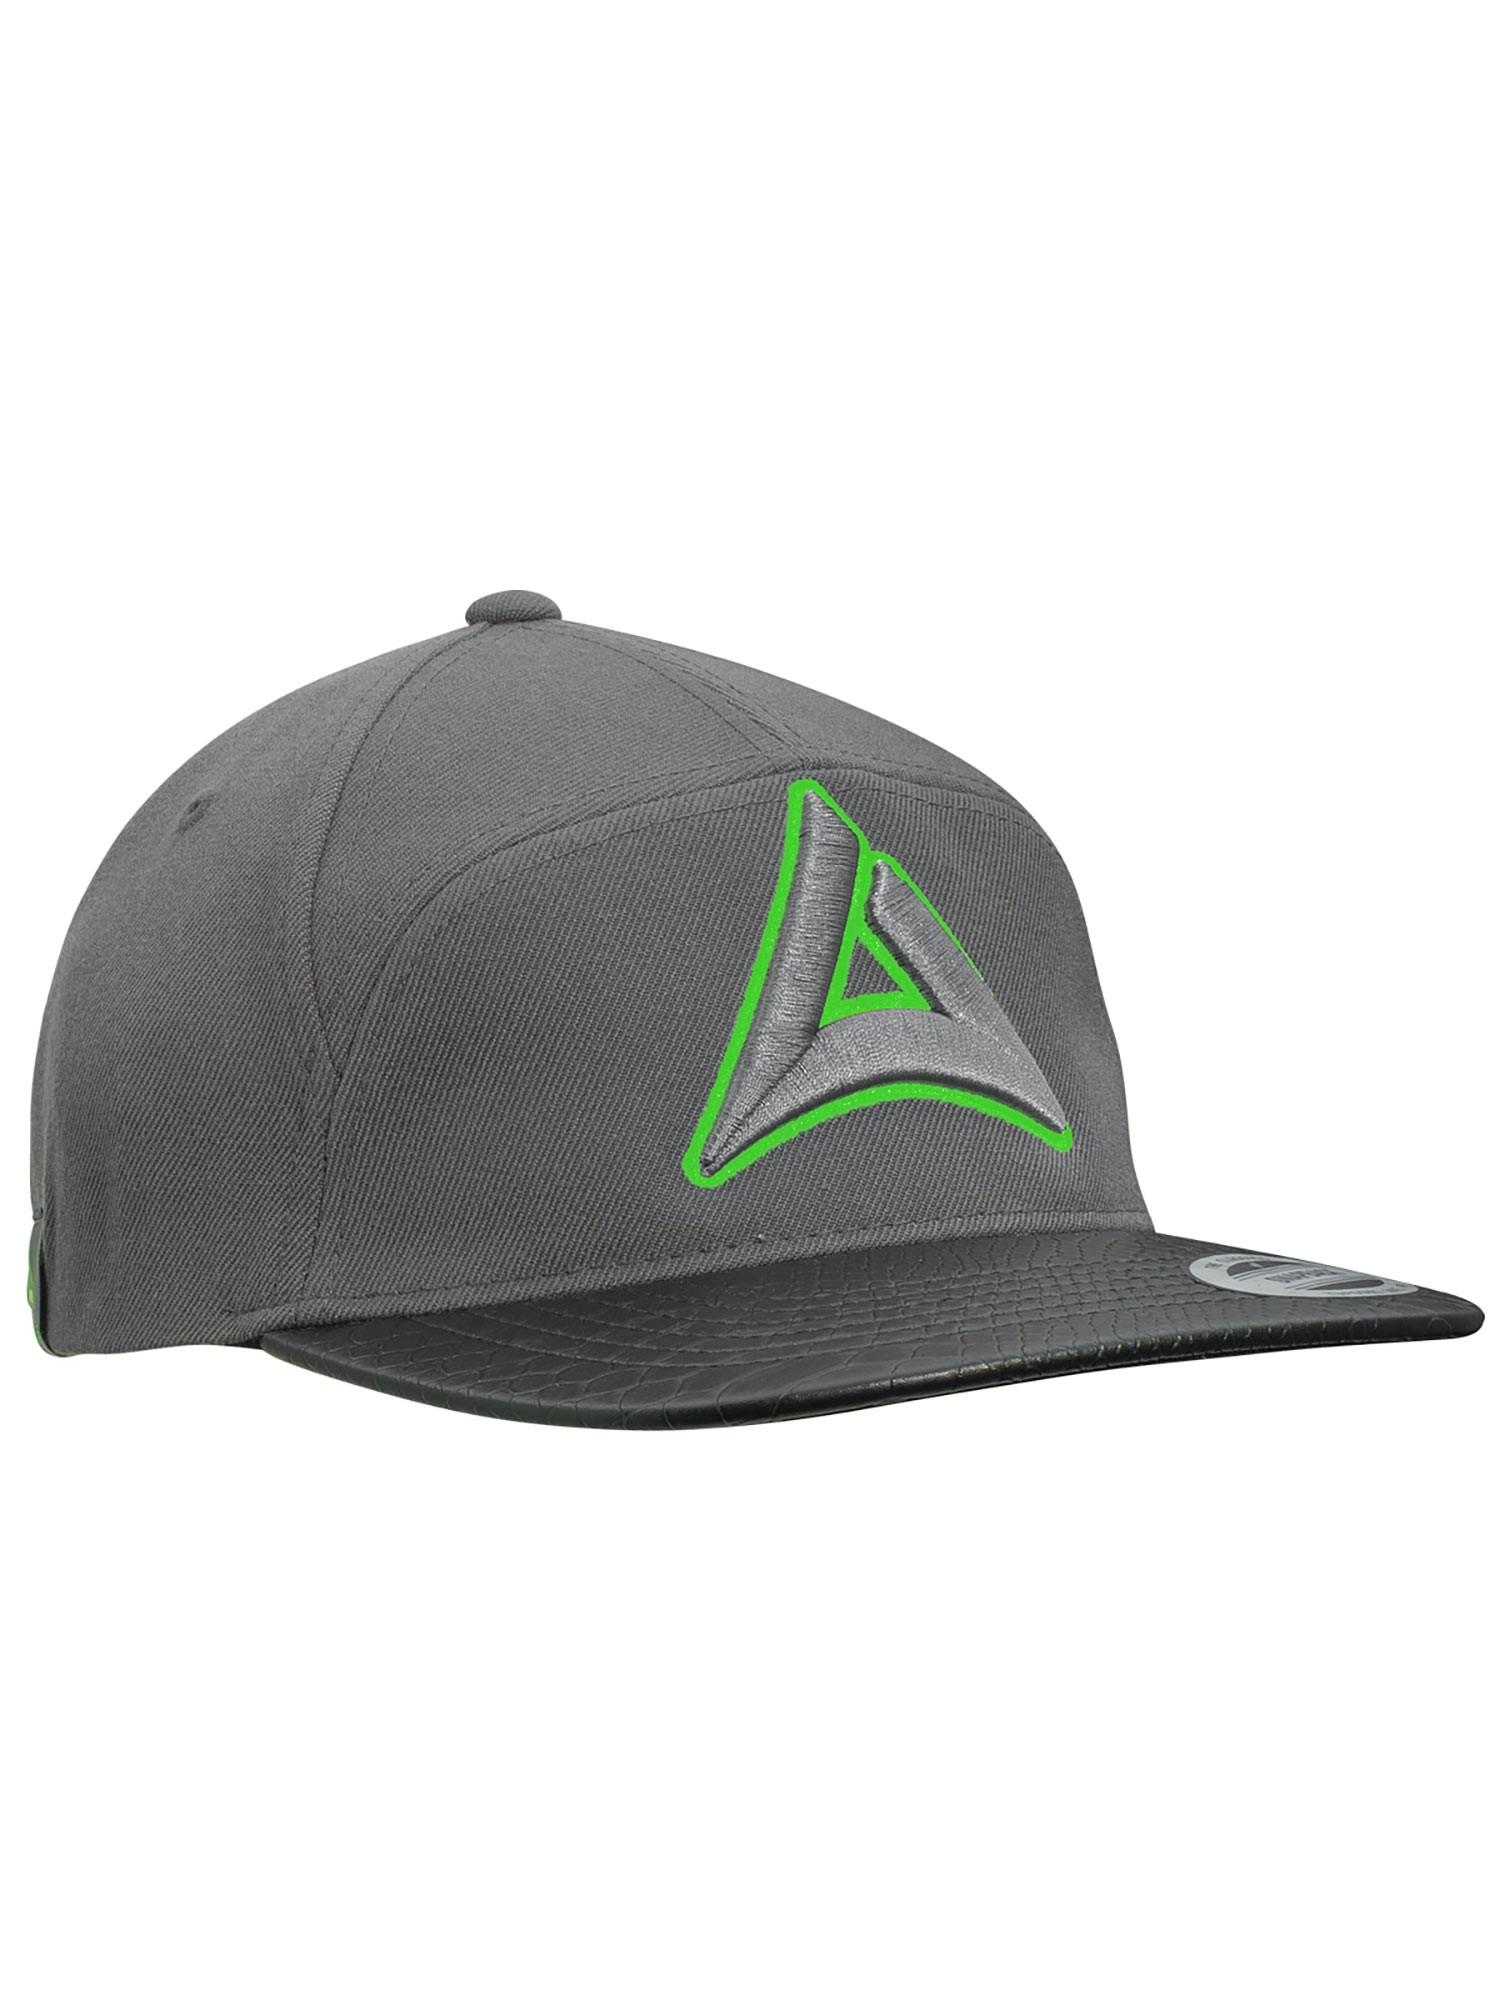 Snapback Base Cap \